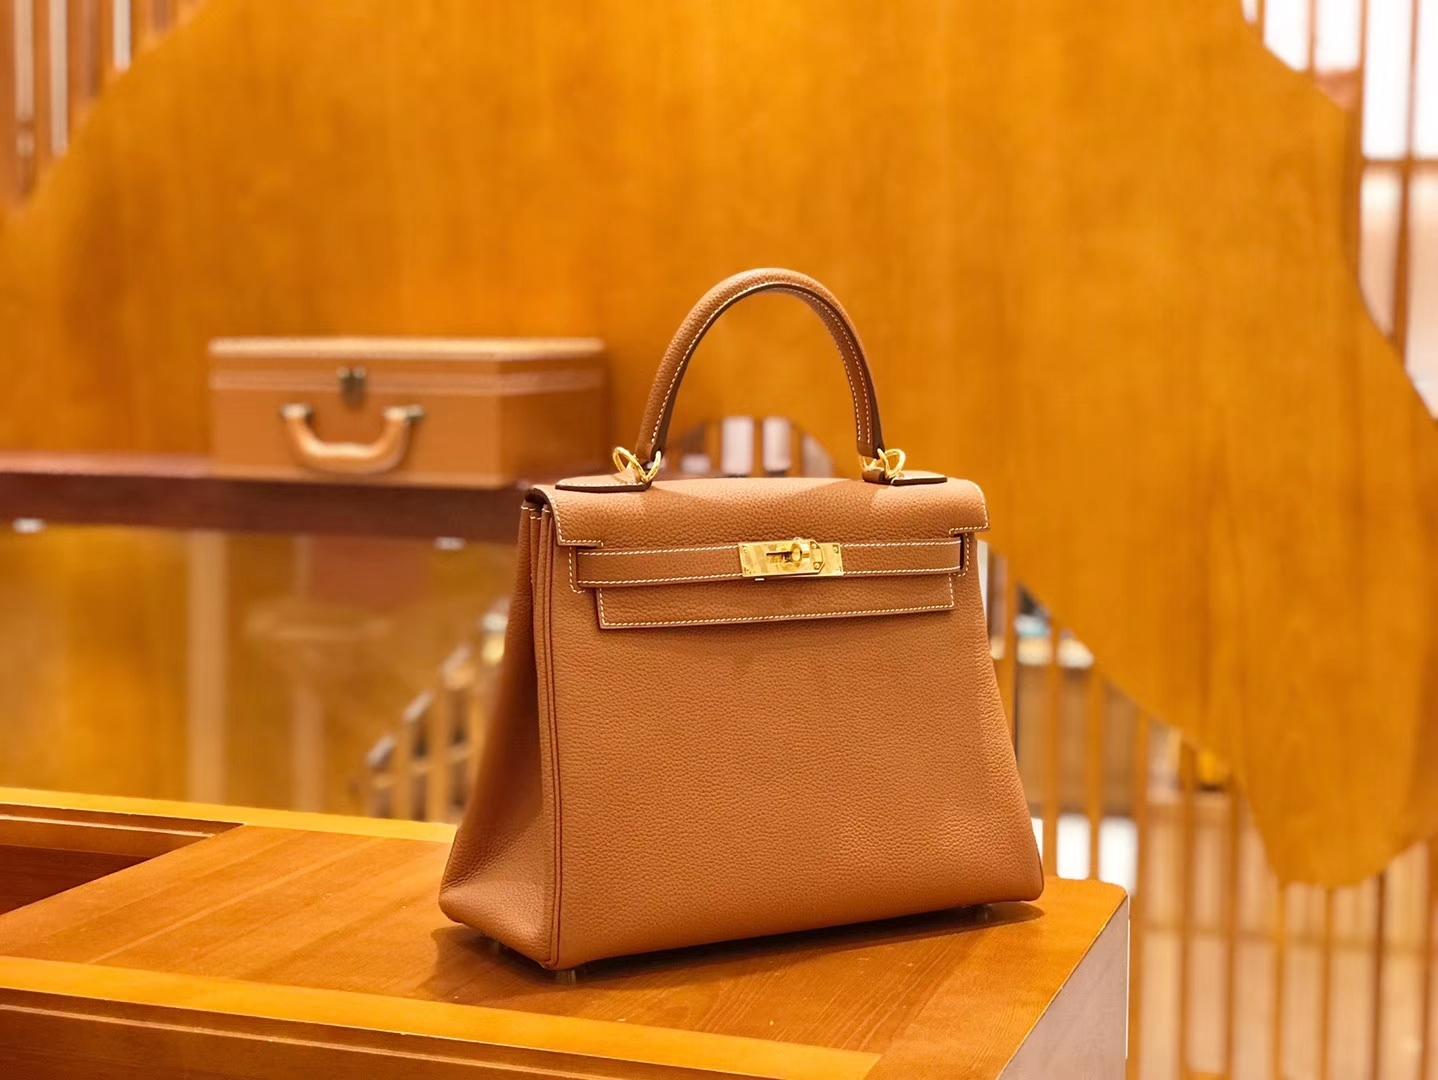 Hermès(爱马仕)Kelly 28cm togo 牛皮 金棕色 金扣 全手工缝制 现货